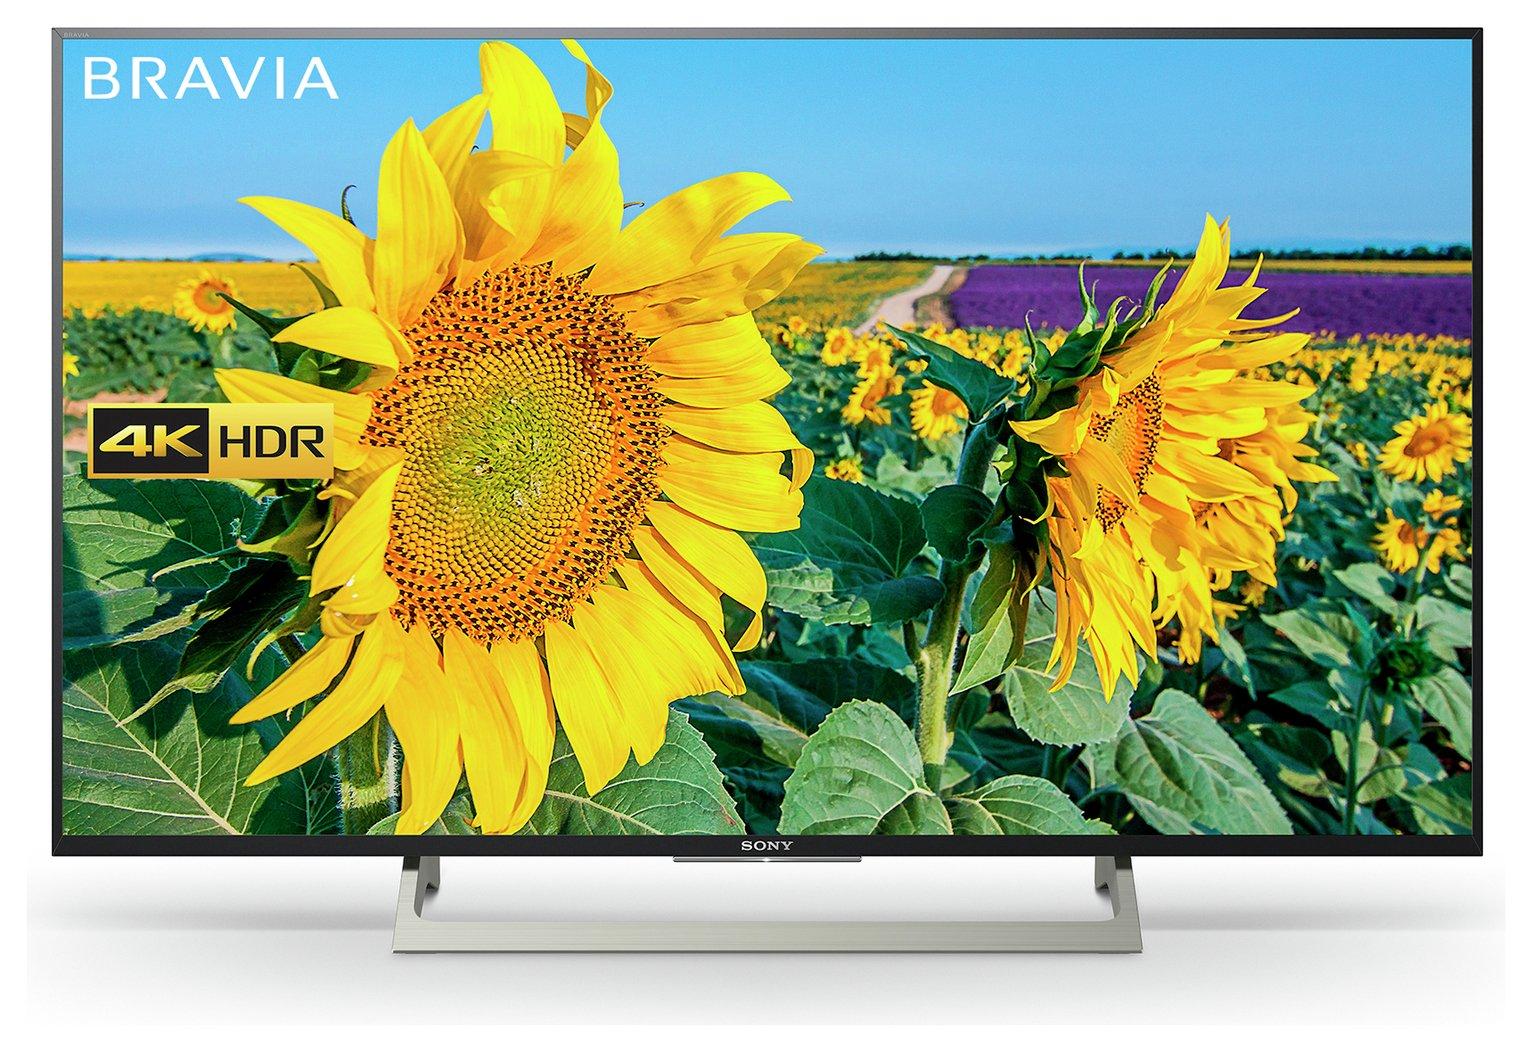 Sony Bravia 43 Inch KD43XF8096 Smart 4K Ultra HD TV with HDR